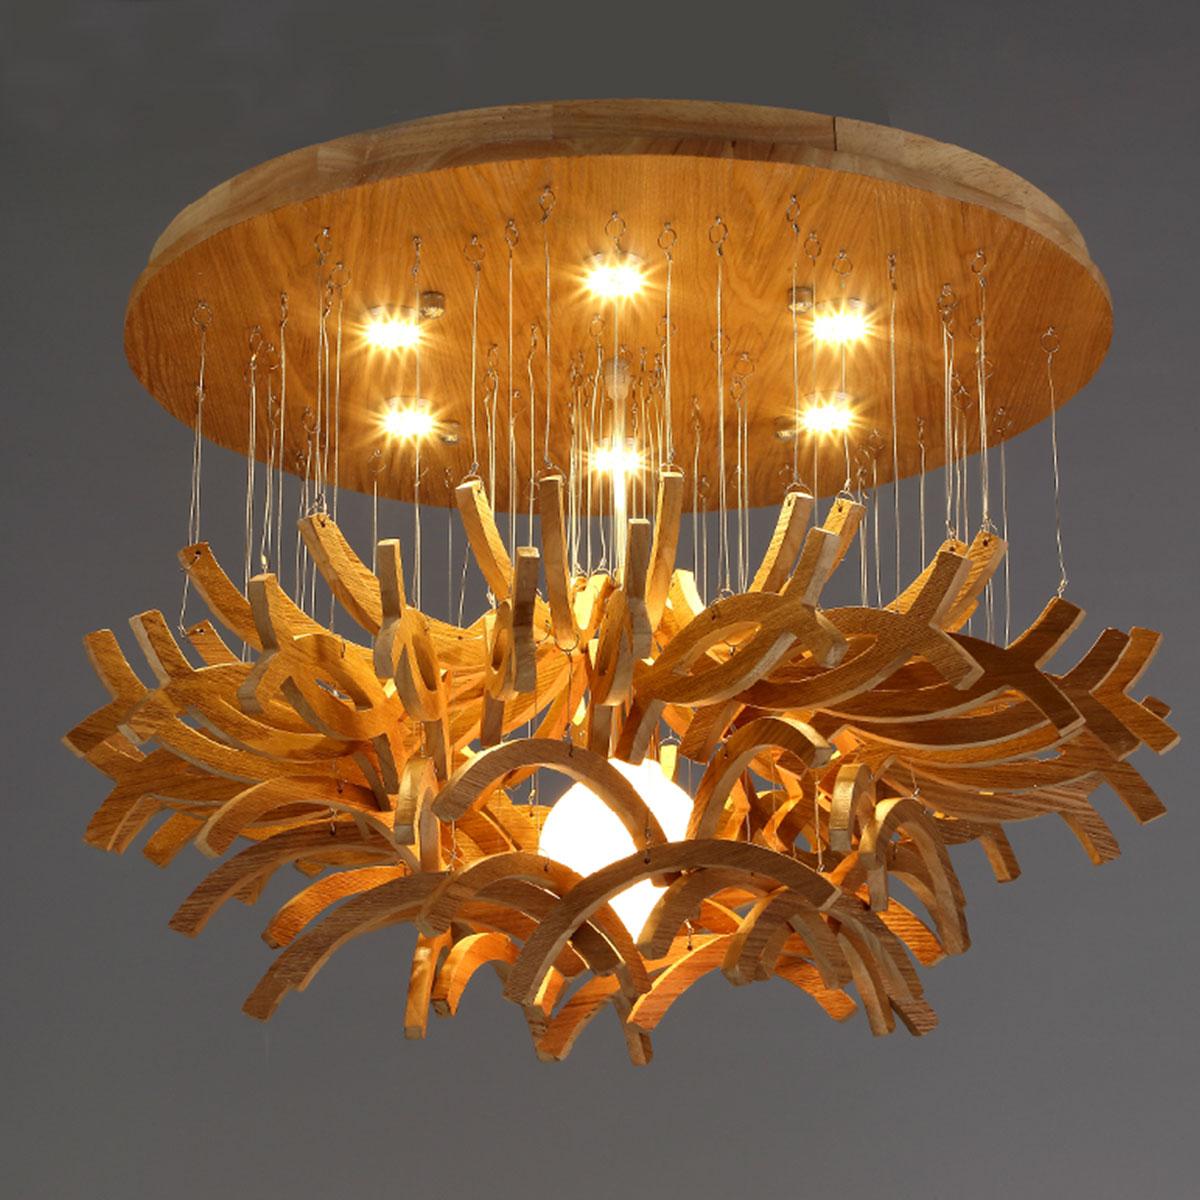 Modern chandelier northern european wood chandelier wooden for Wood dining room chandeliers